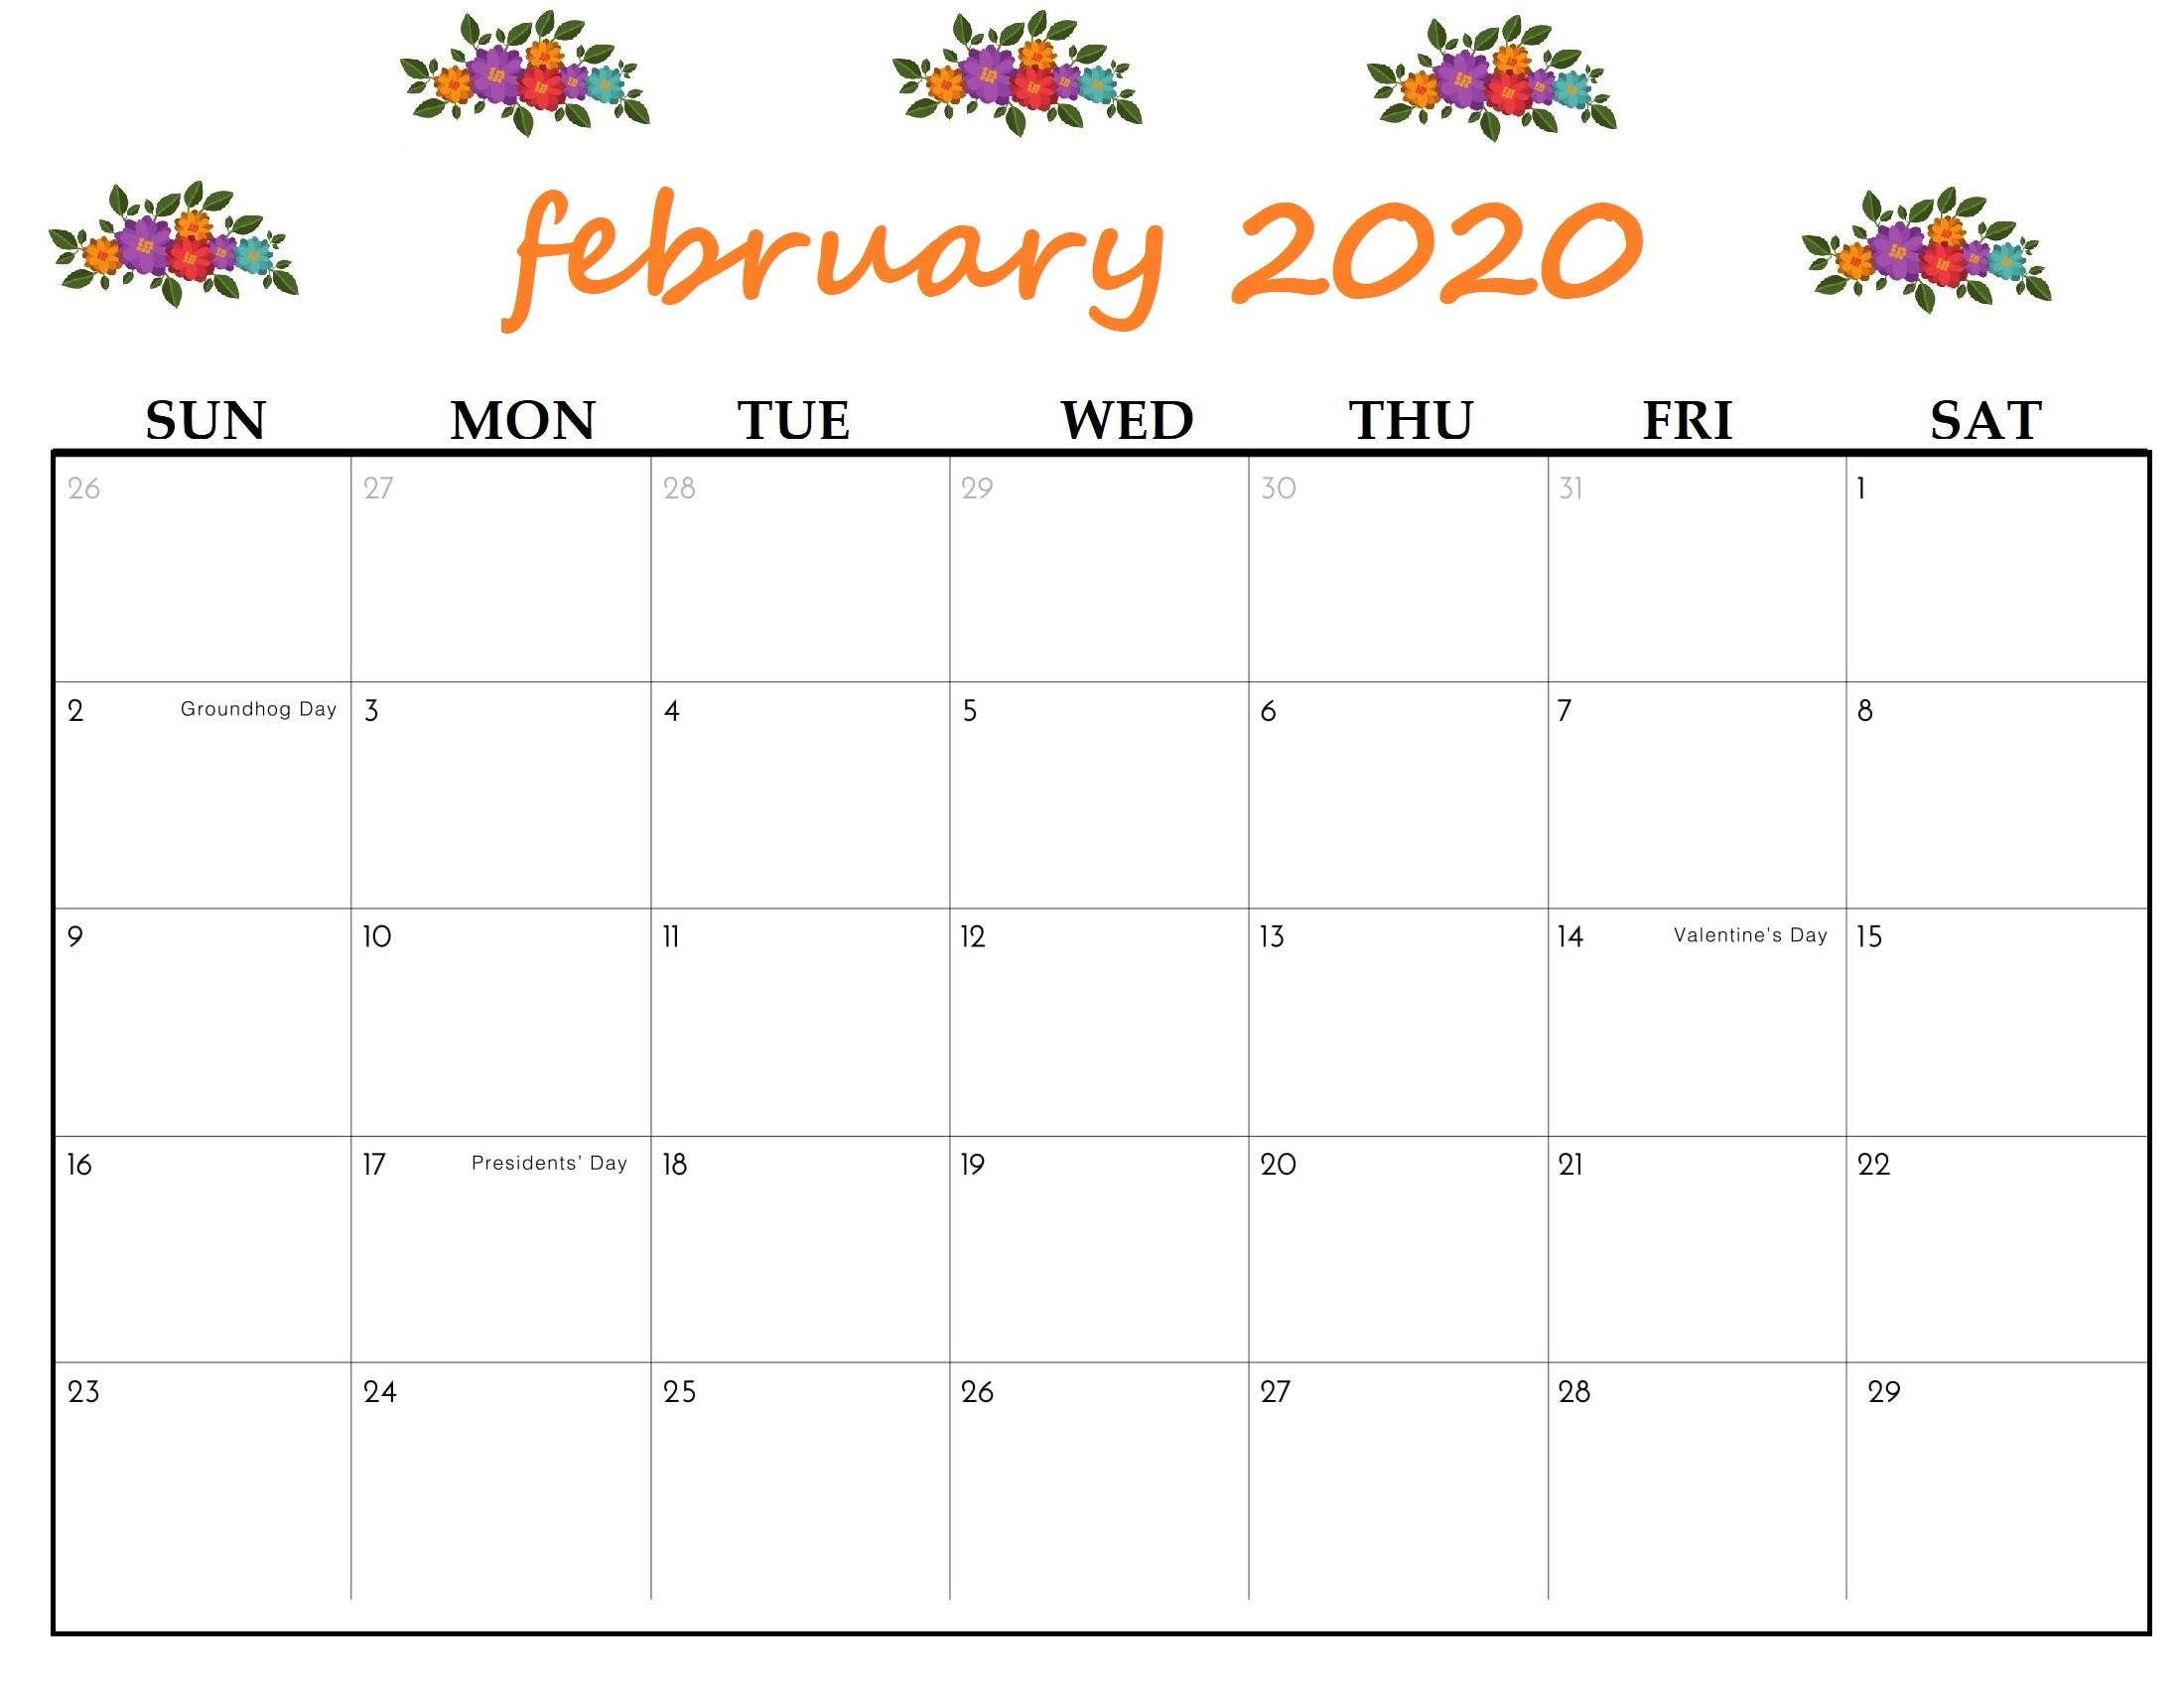 Free Cute February 2020 Calendar – Simple And Very Pretty